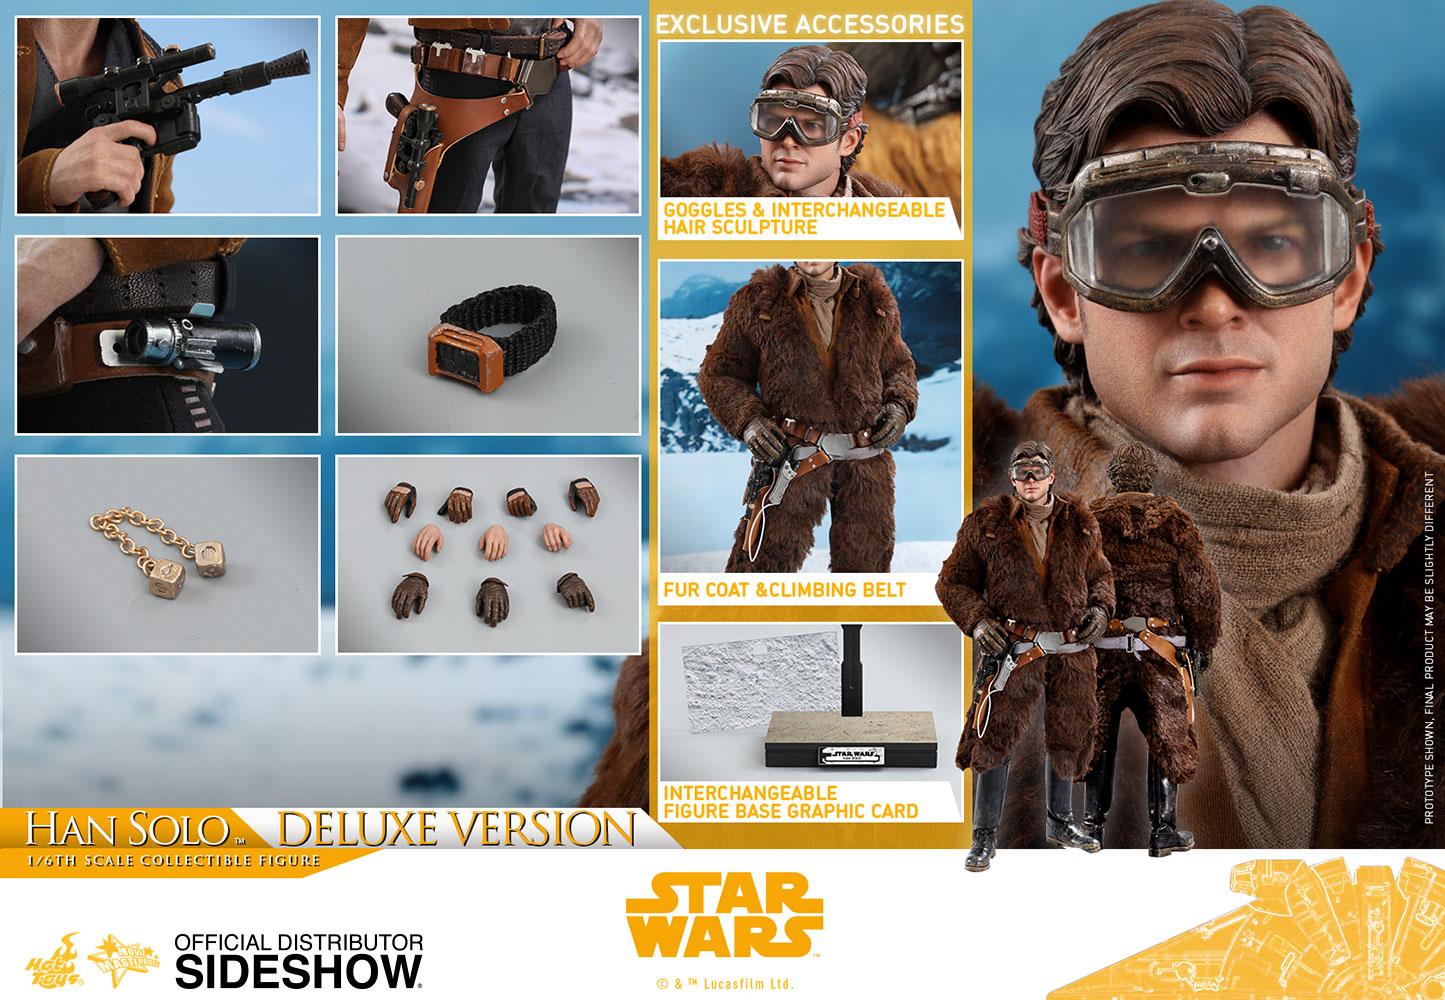 Han-Solo-deluxe-sixth-scale-figure-09